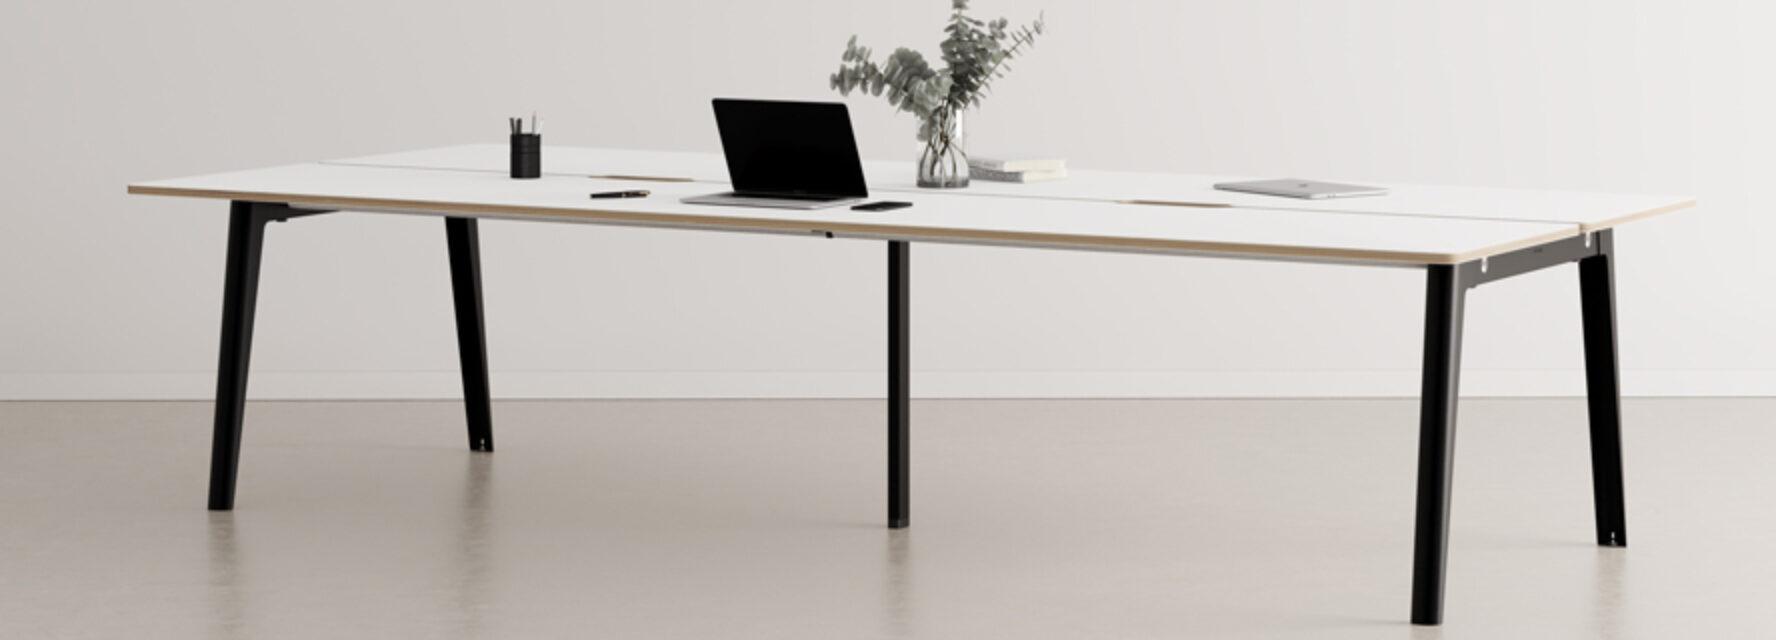 Bureaux open space - TIPTOE